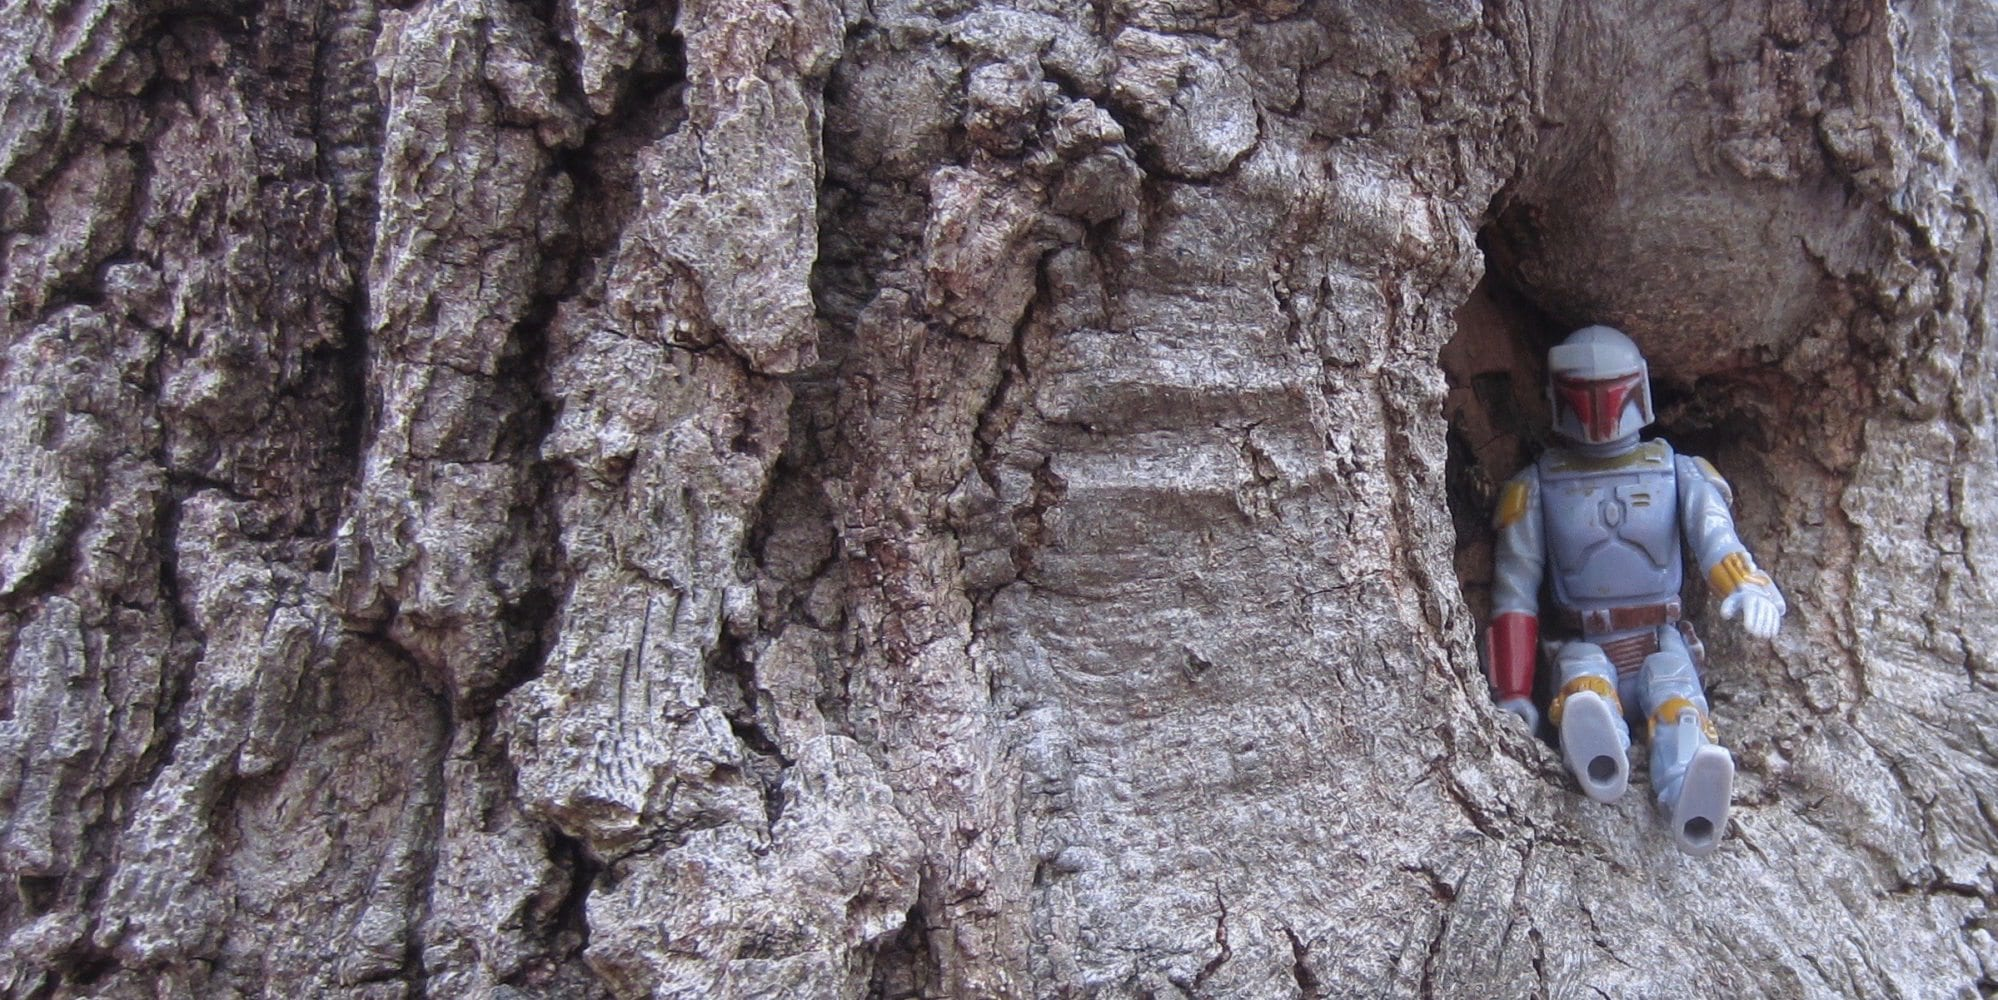 Boba Fett Sitting In A Tree